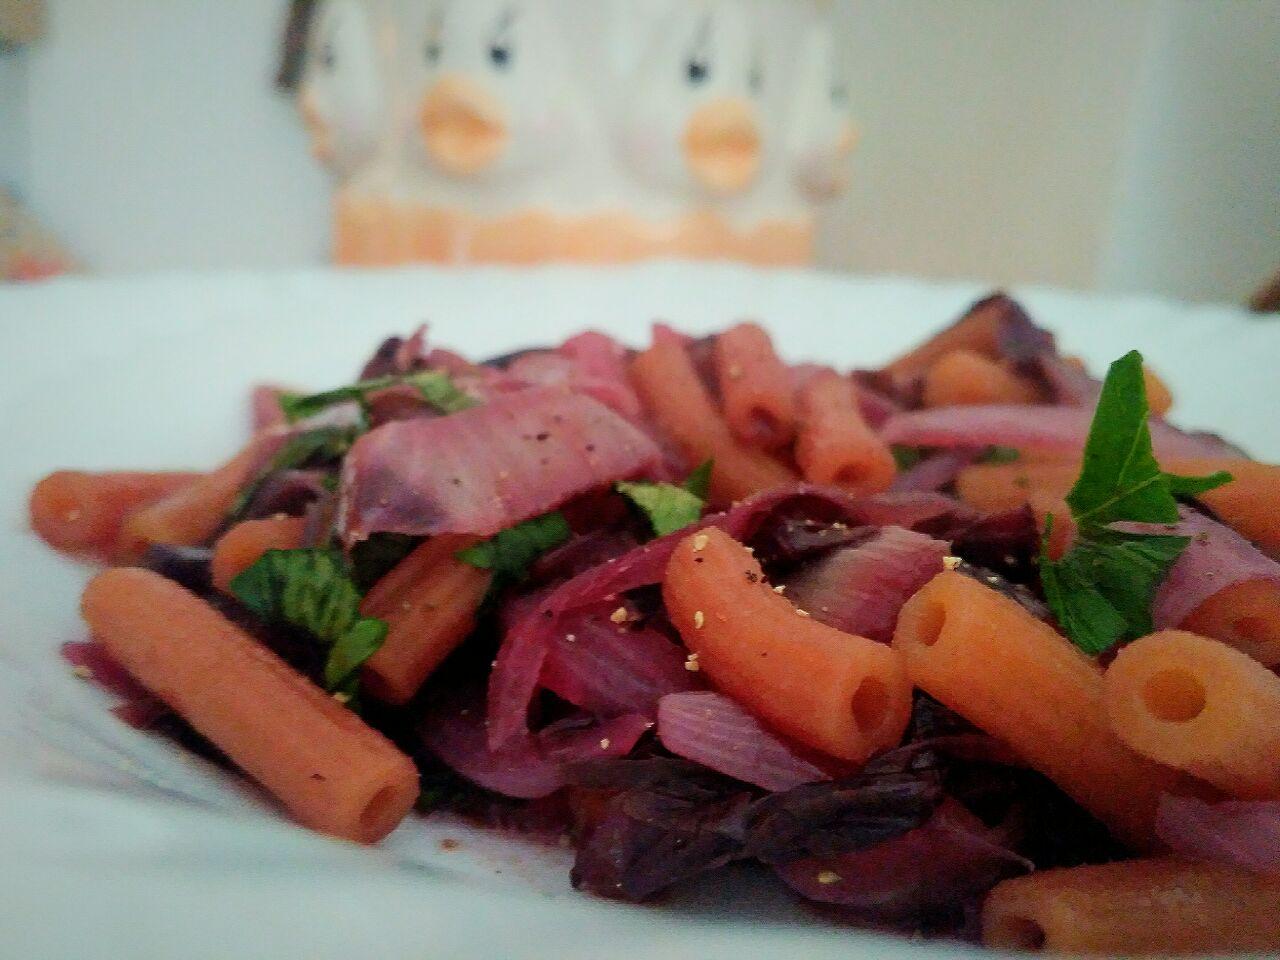 Sedanini di lenticchie rosse con cipolla e radicchio